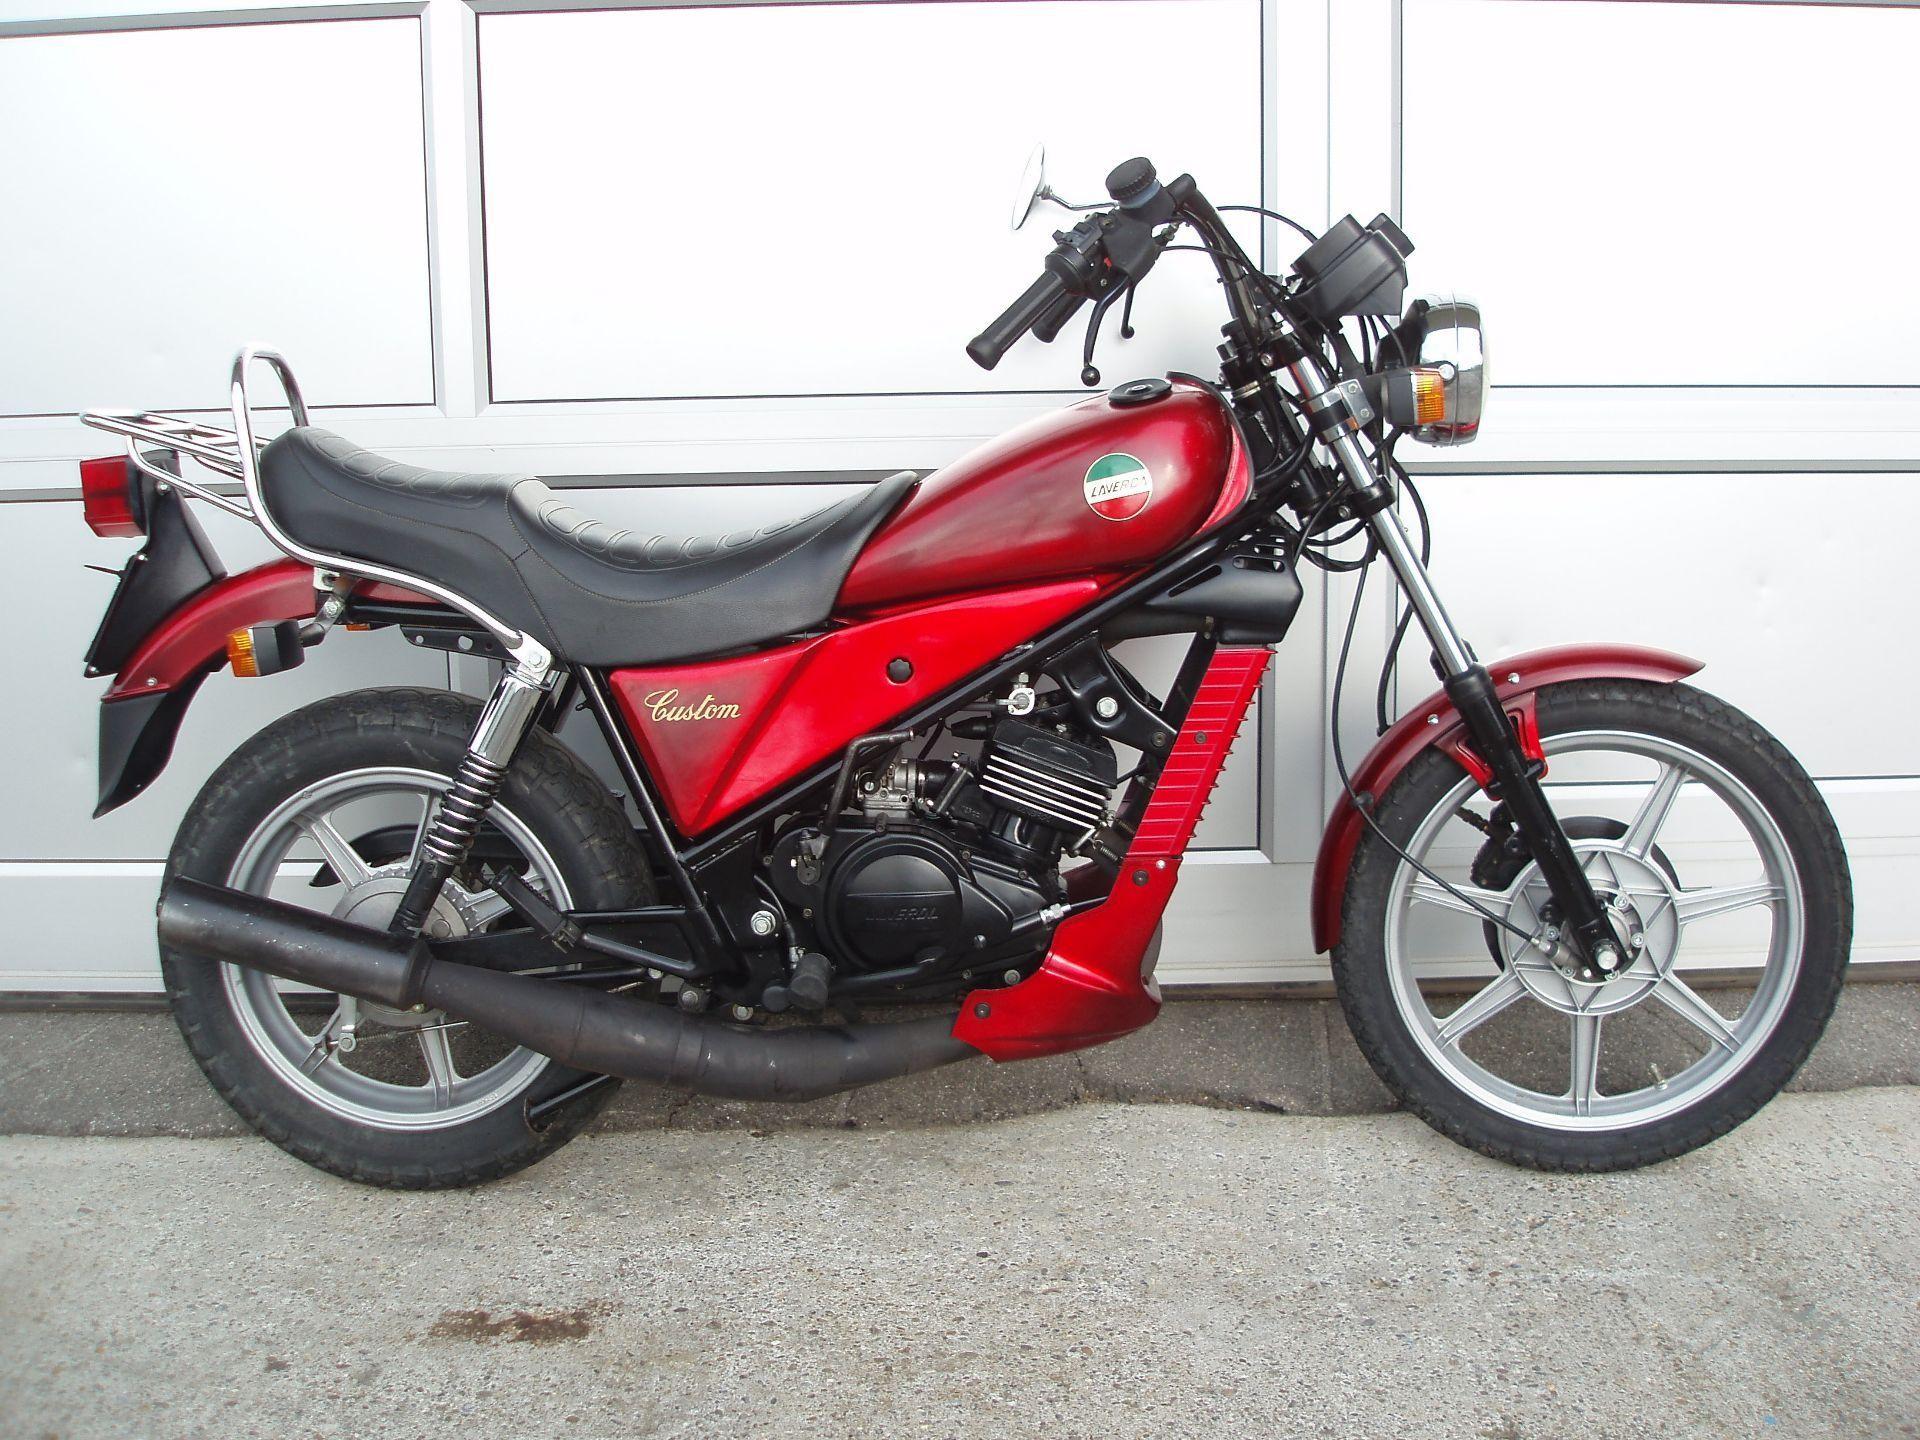 Laverda LZ 125 25383   MondoCustom.it